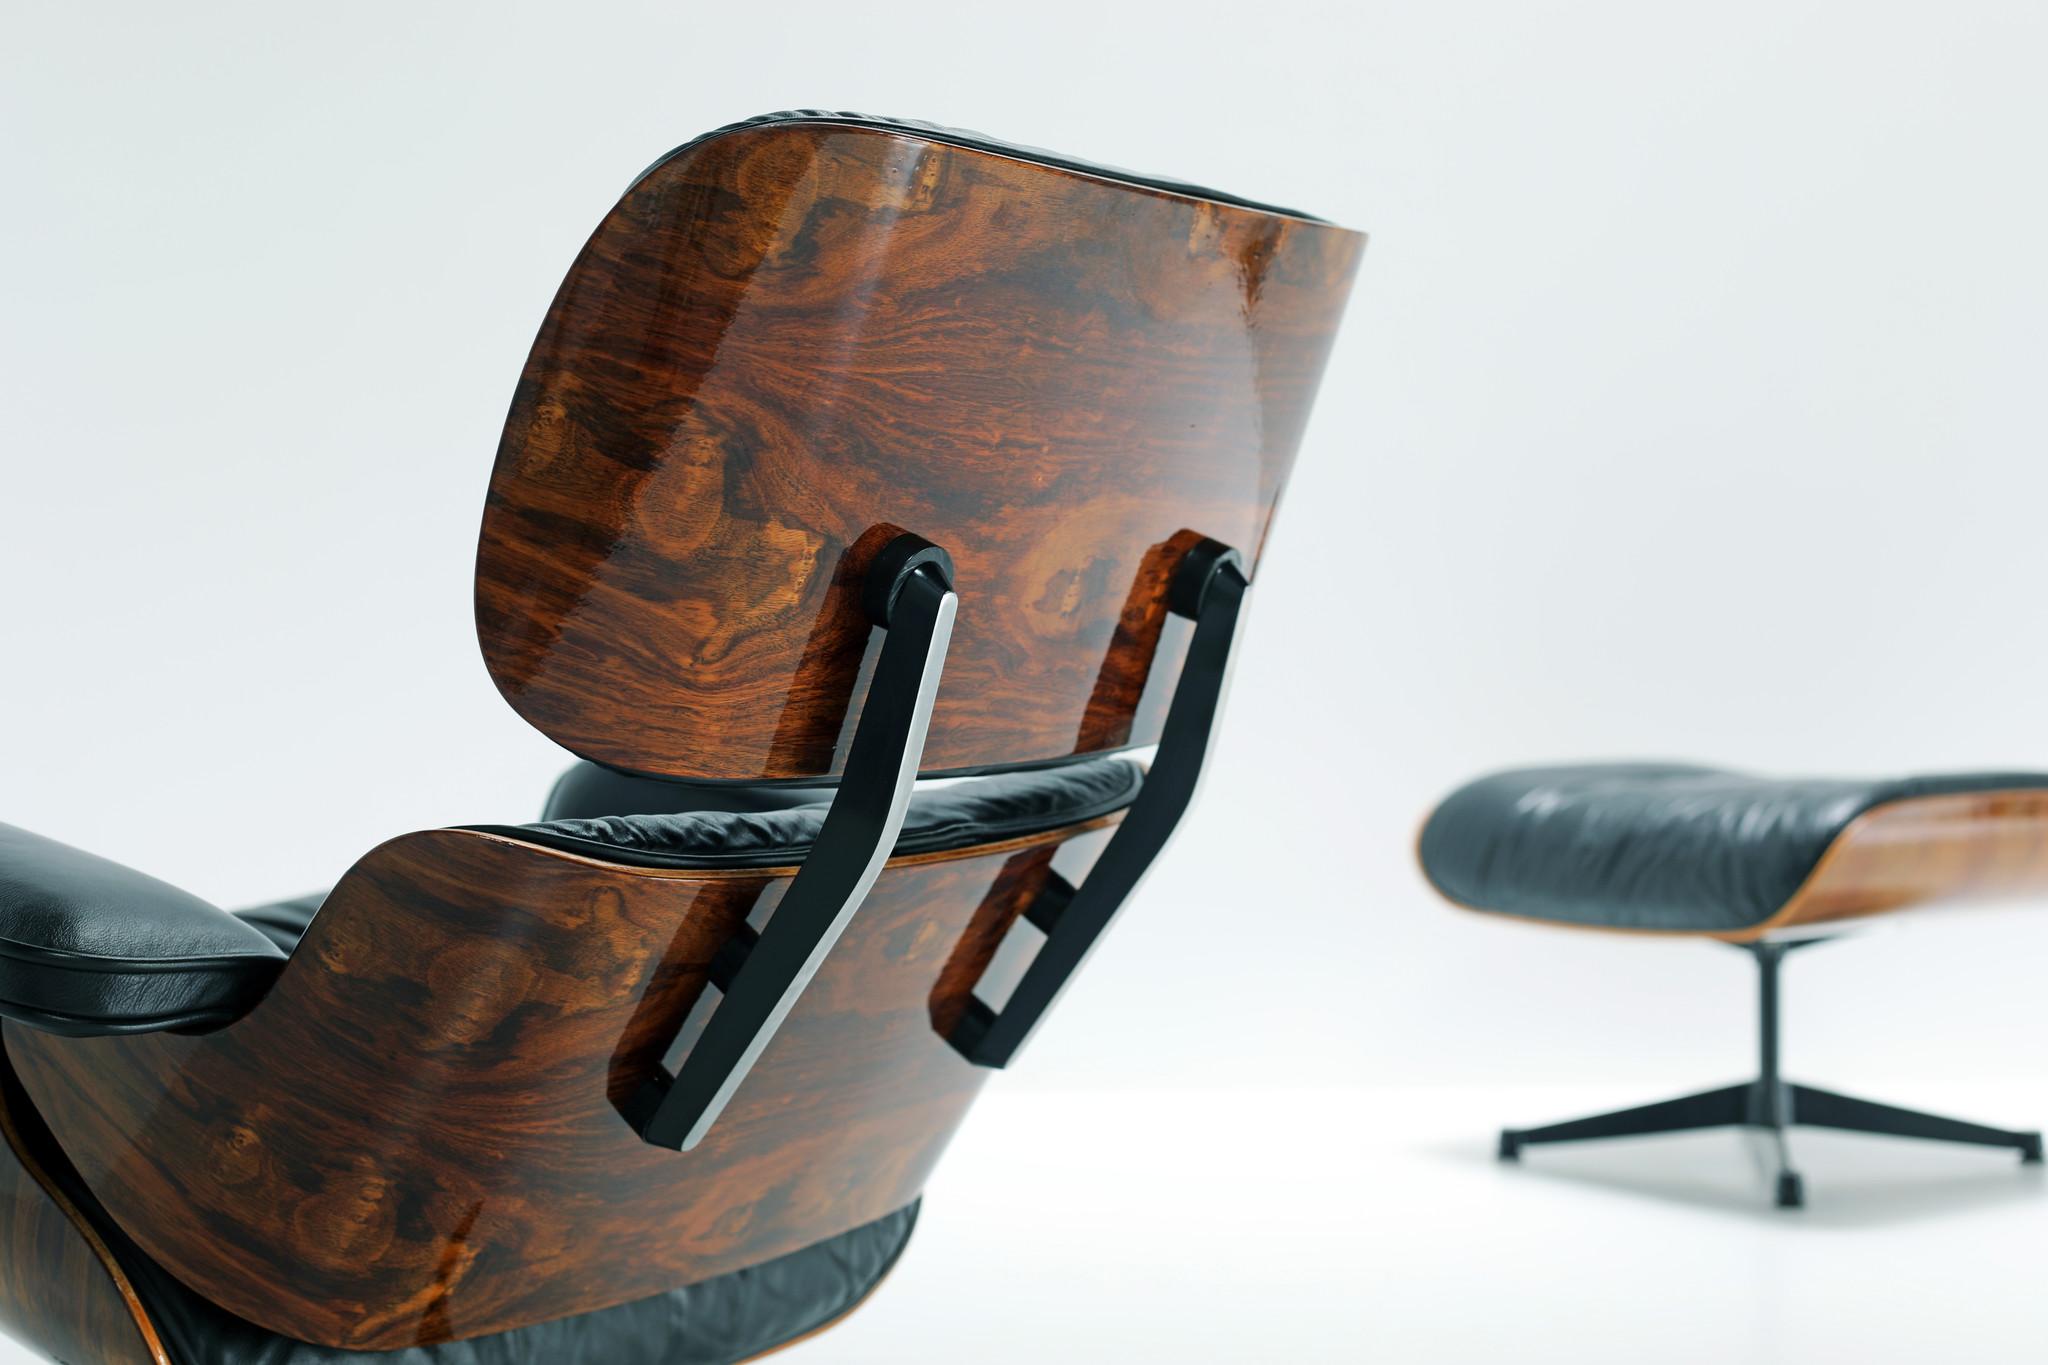 Vintage Eames lounge chair & ottoman Vitra, 1988